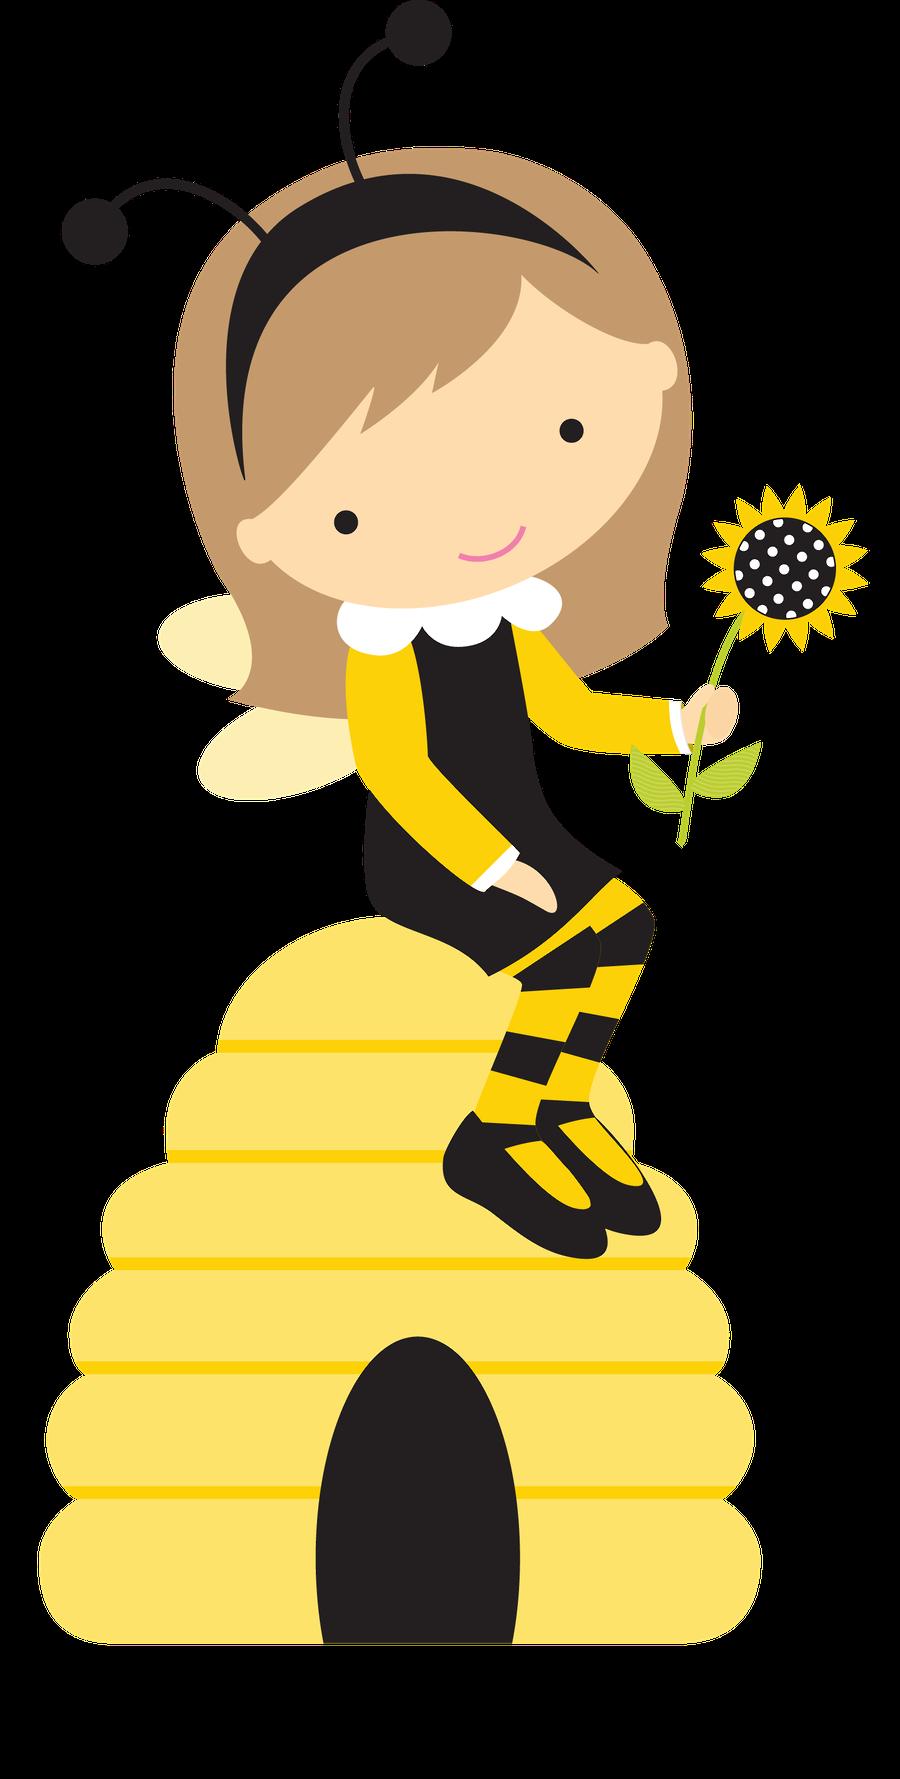 Abelhinhas minus para experimentar. Girly clipart bee